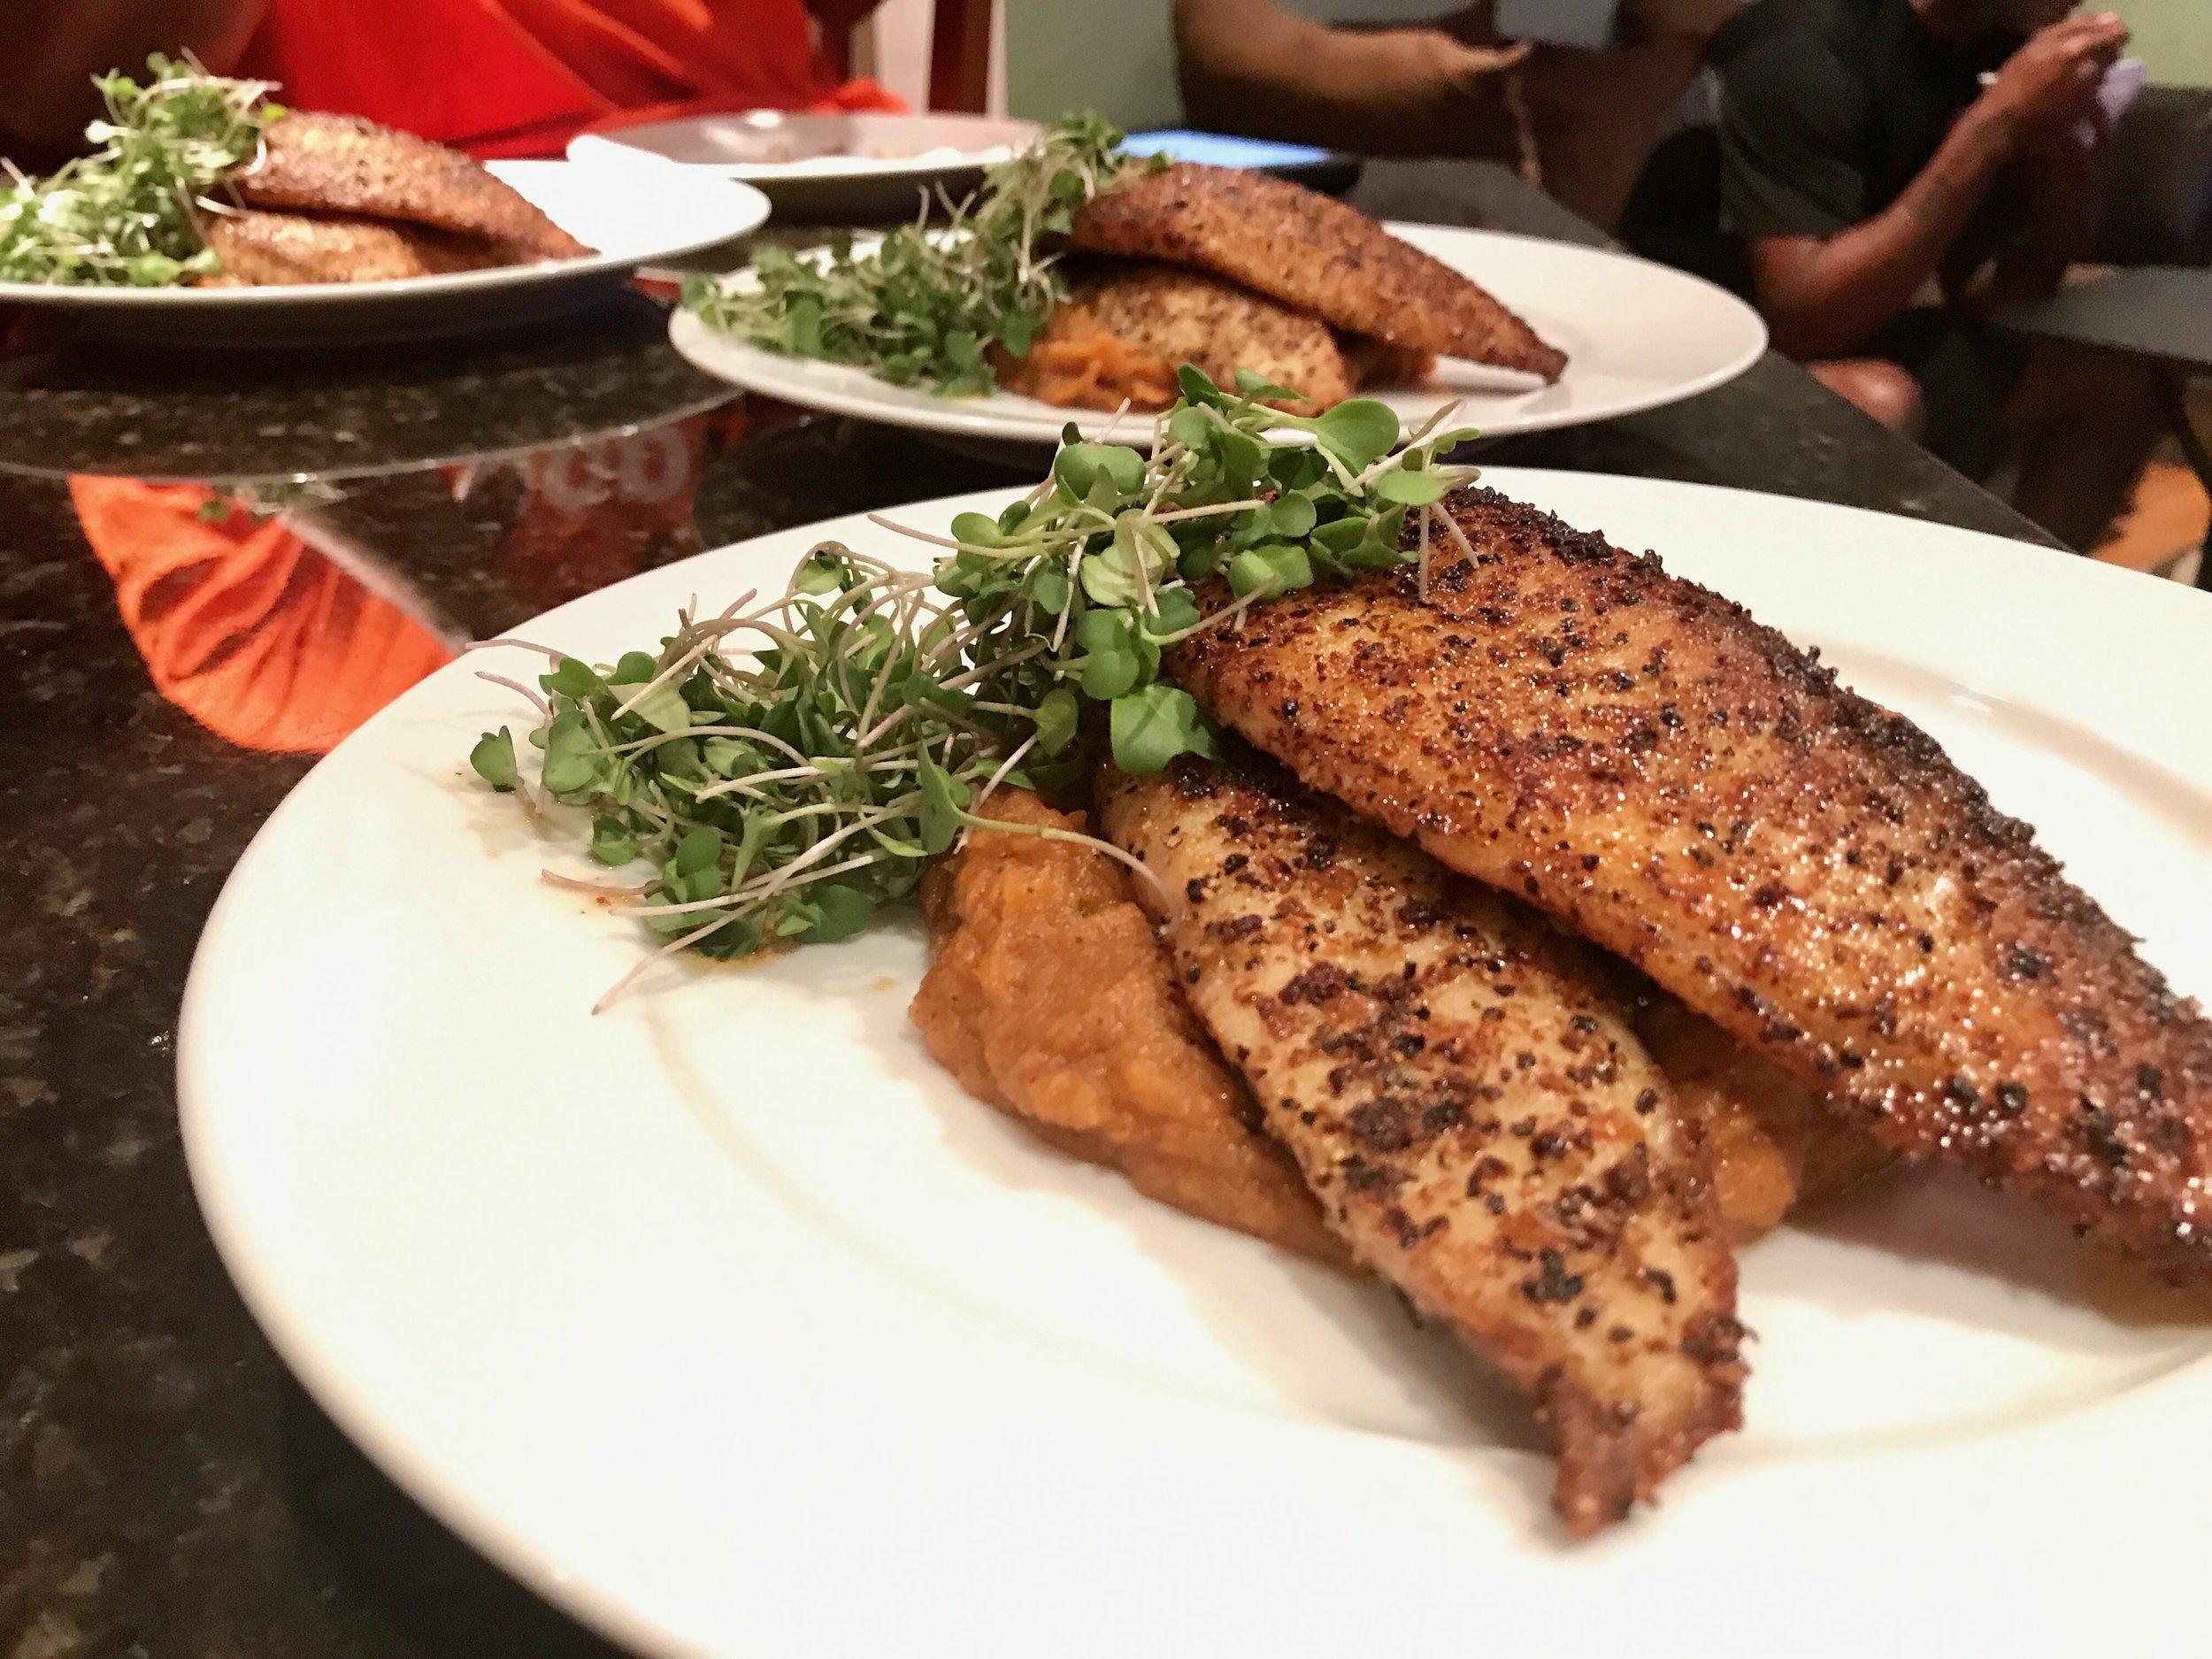 Spicy White Fish. Candied Sweet Potato Mash. Micro Broccoli Greens.